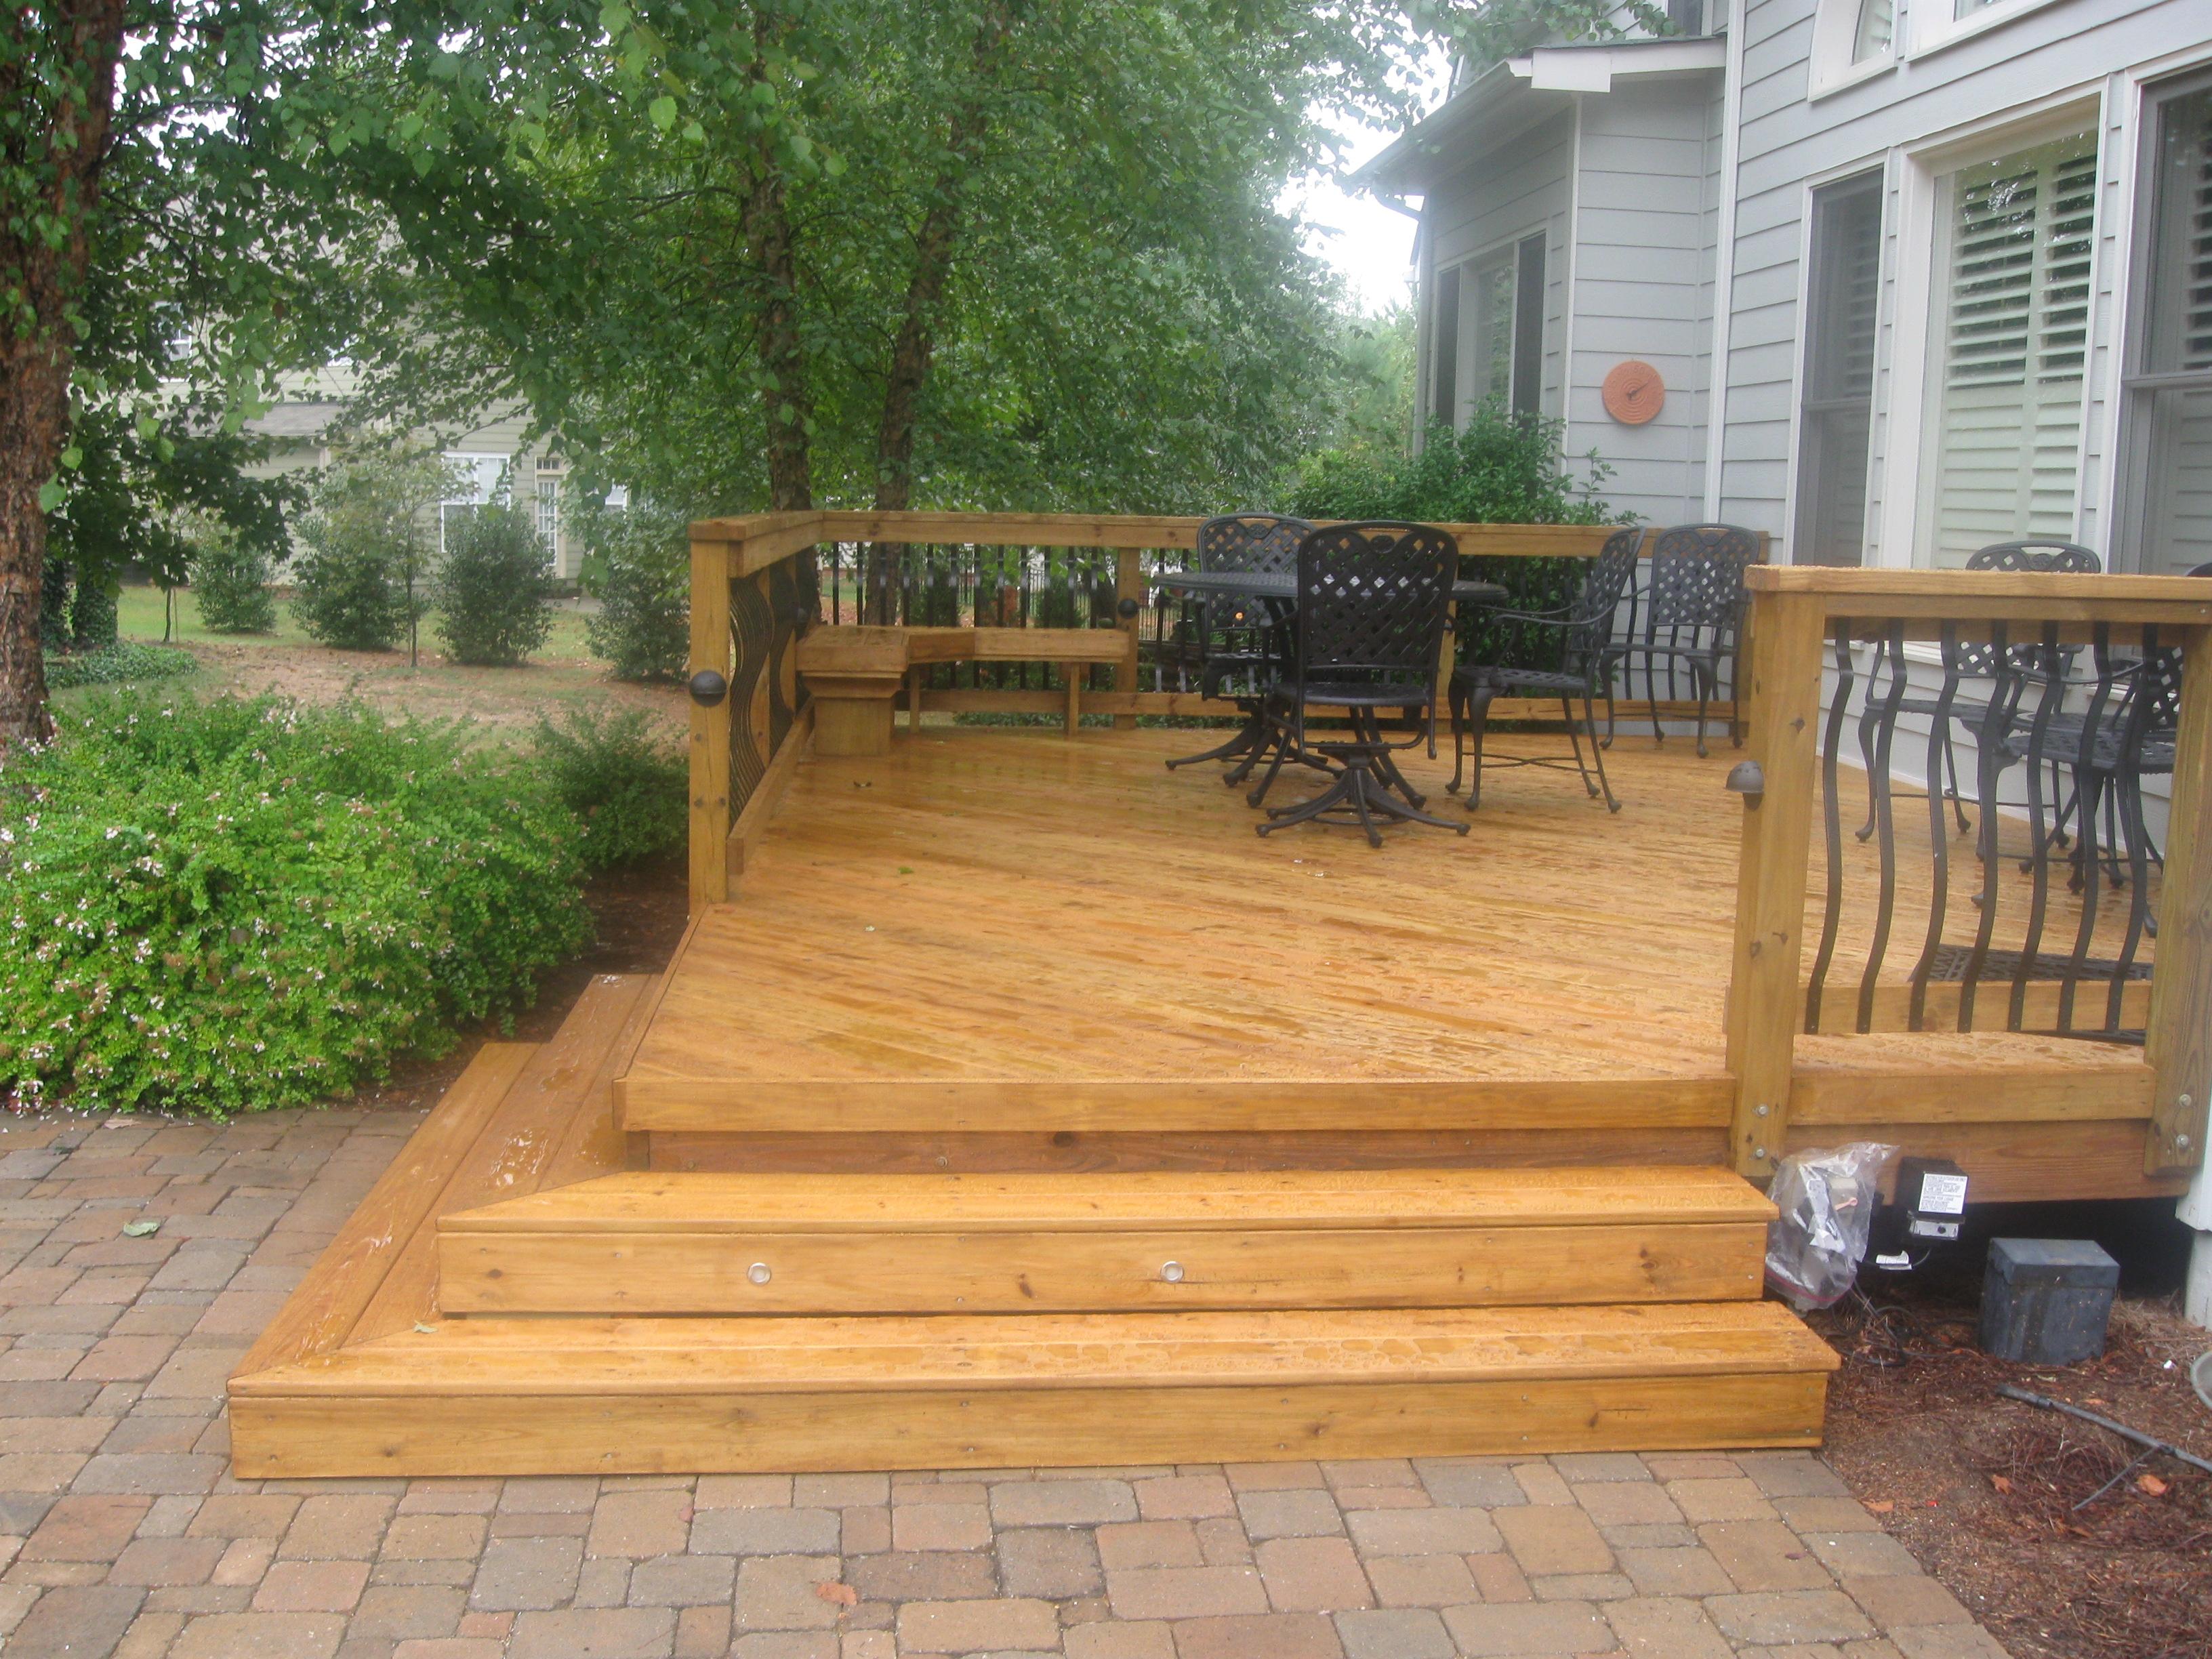 Best Raleigh Deck Builder on Backyard Wood Patio Ideas id=59444